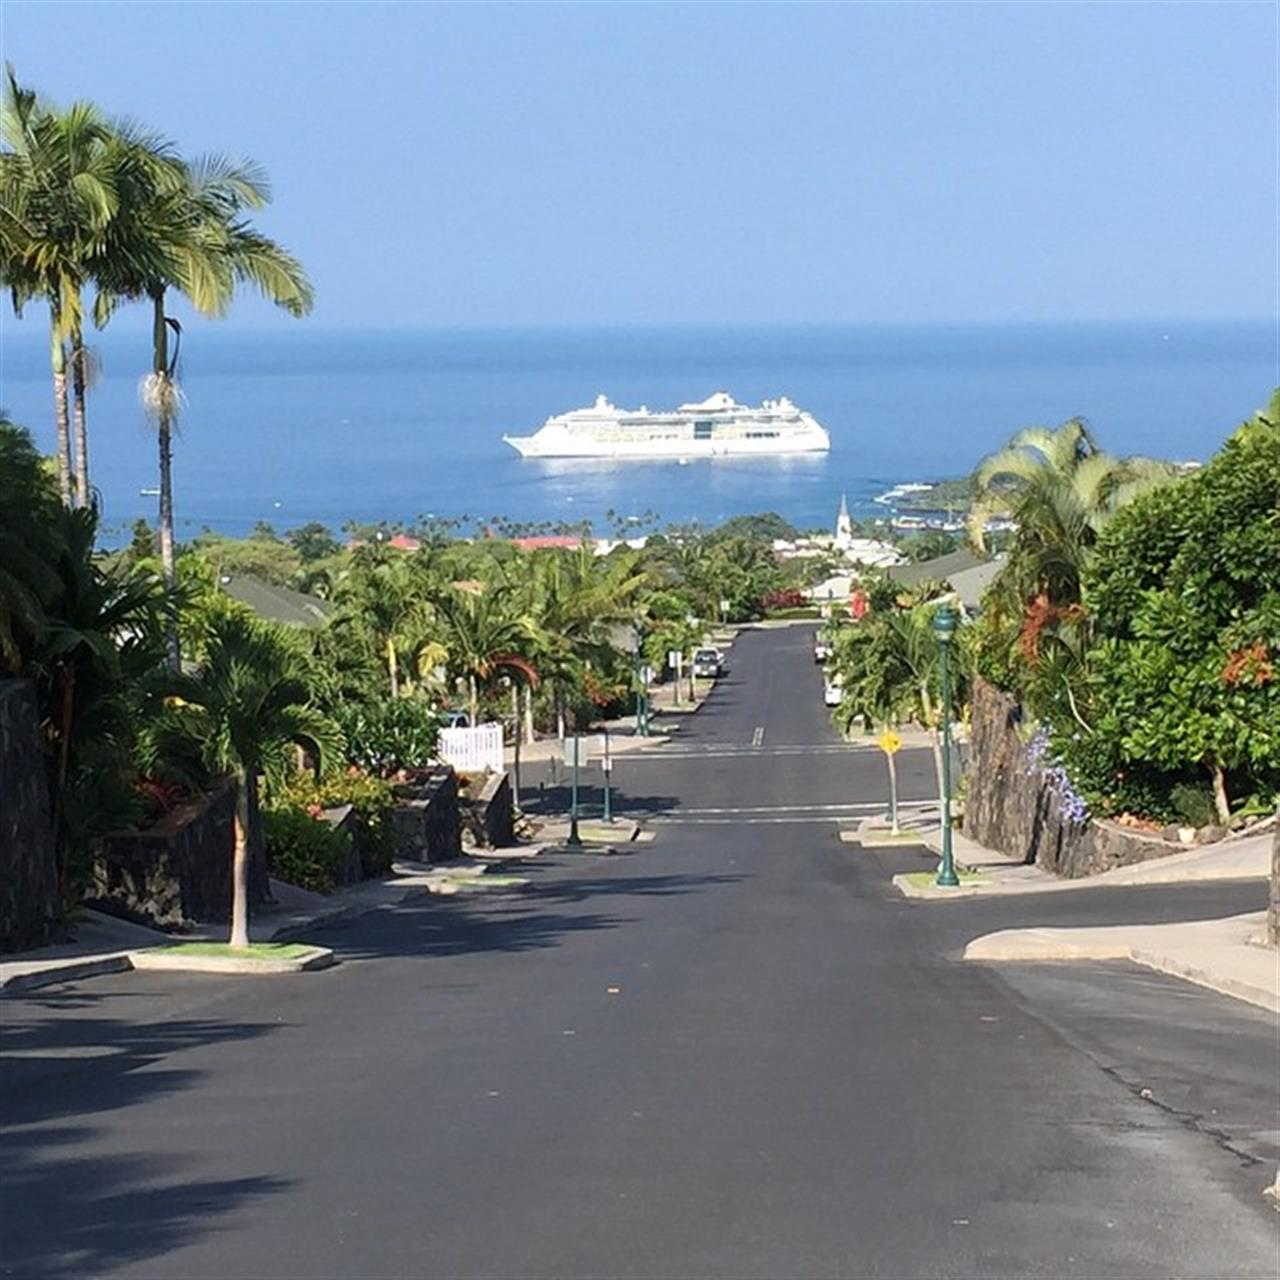 Another cruise ship this week to Kaulua-Kona. #LeadingRELocal #Kona #ClarkHawaii